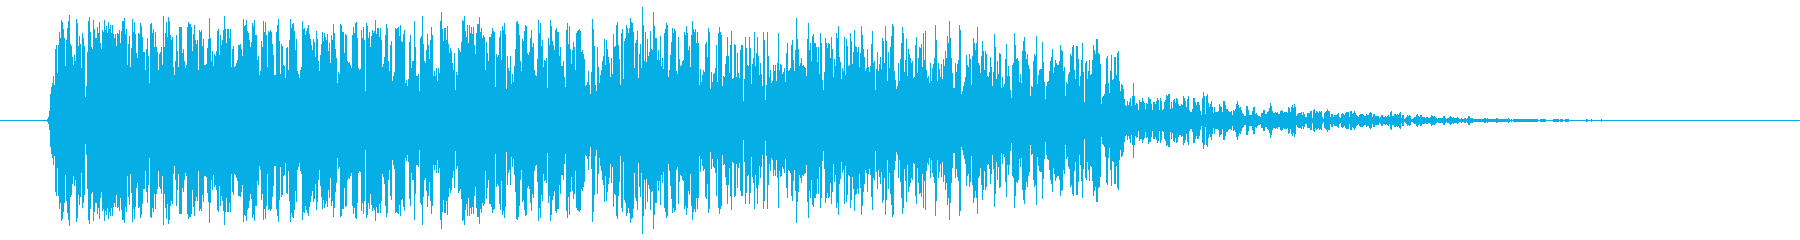 DEBRIS爆発と爆弾による大気圧爆発の再生済みの波形